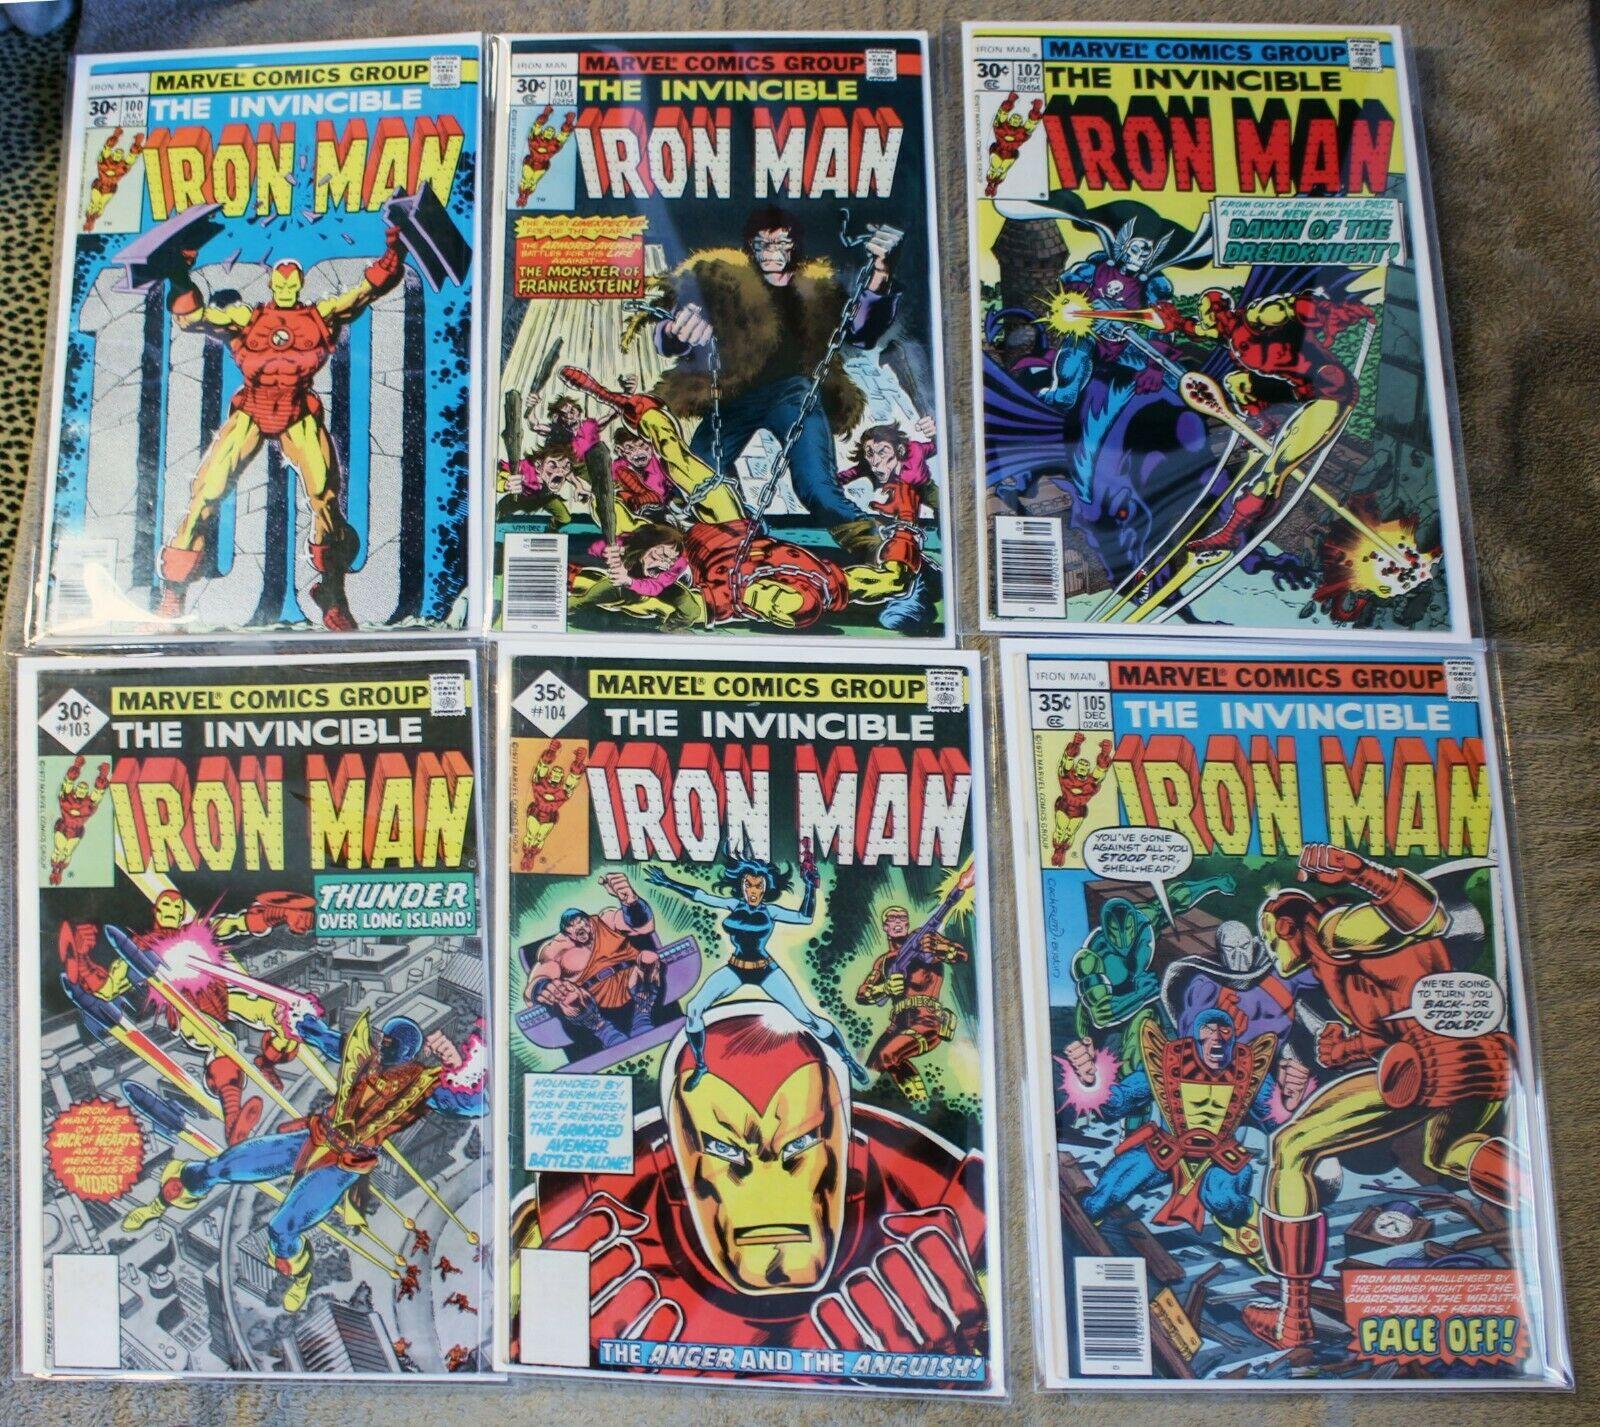 Iron Man #100 - #199 Avg VF/NM High Grade Lot .. 4 issues missing